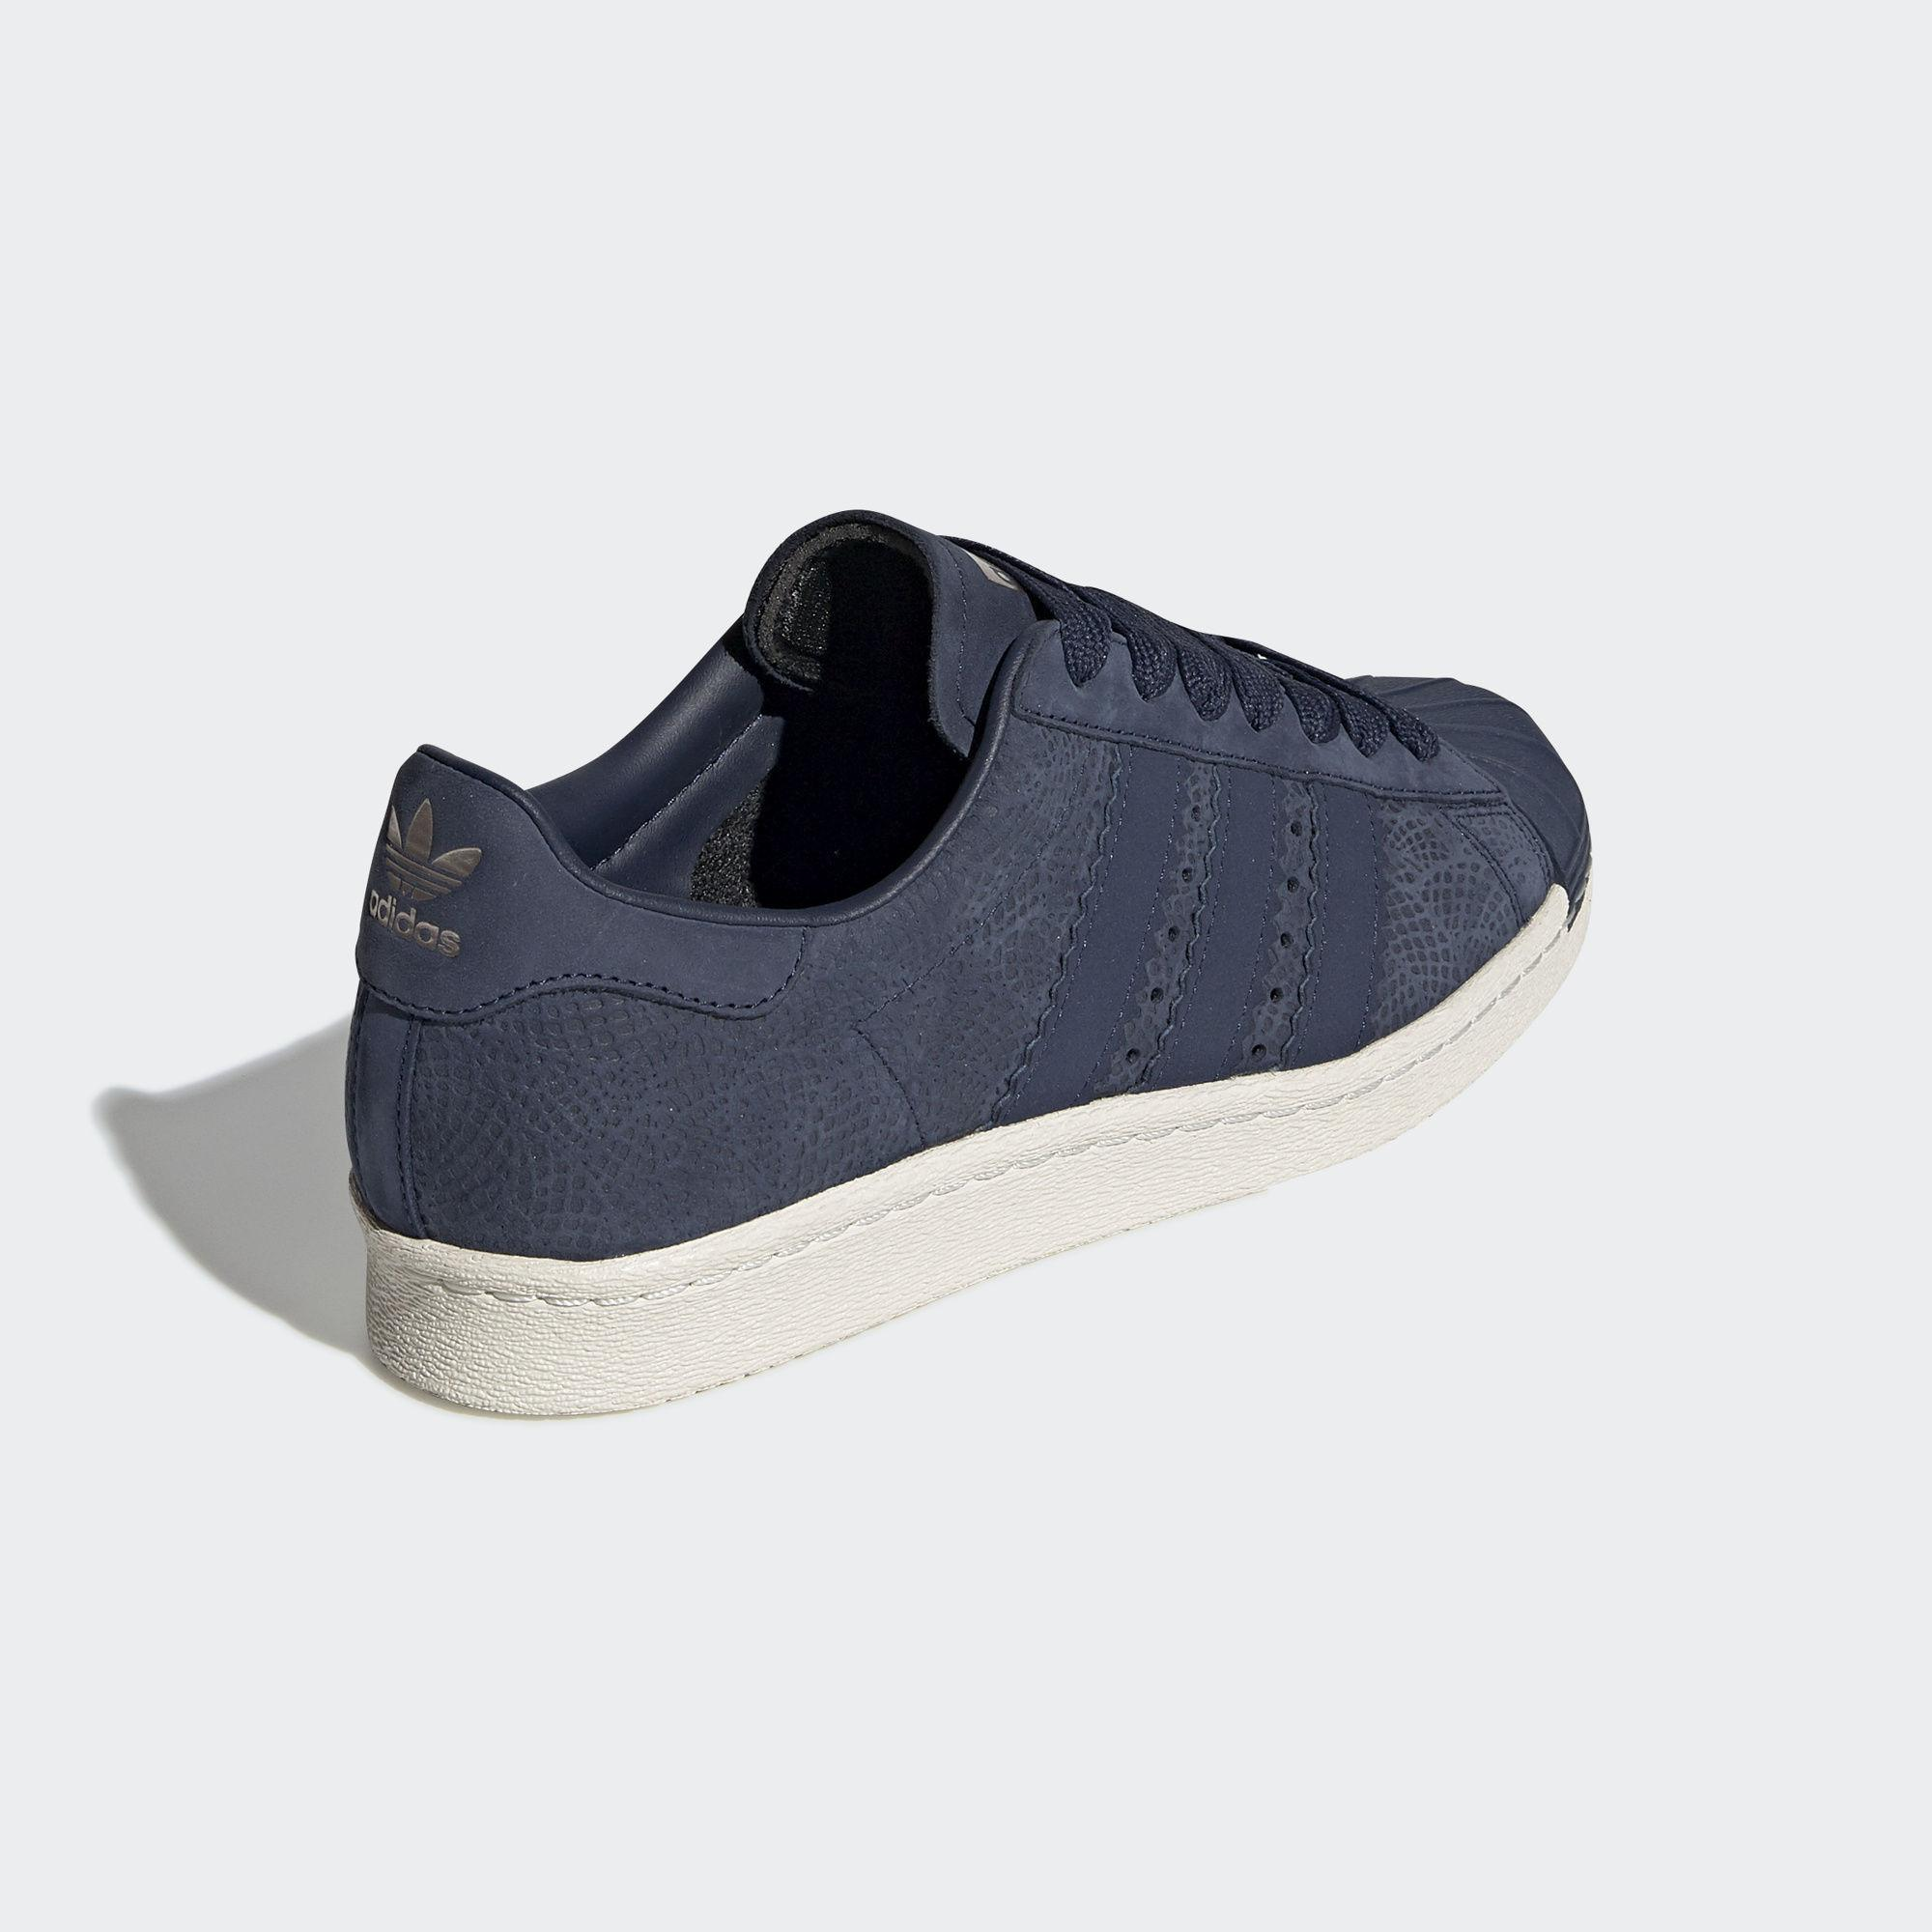 promo code 682f0 617f3 Adidas - Blue Superstar 80s Shoes - Lyst. View fullscreen